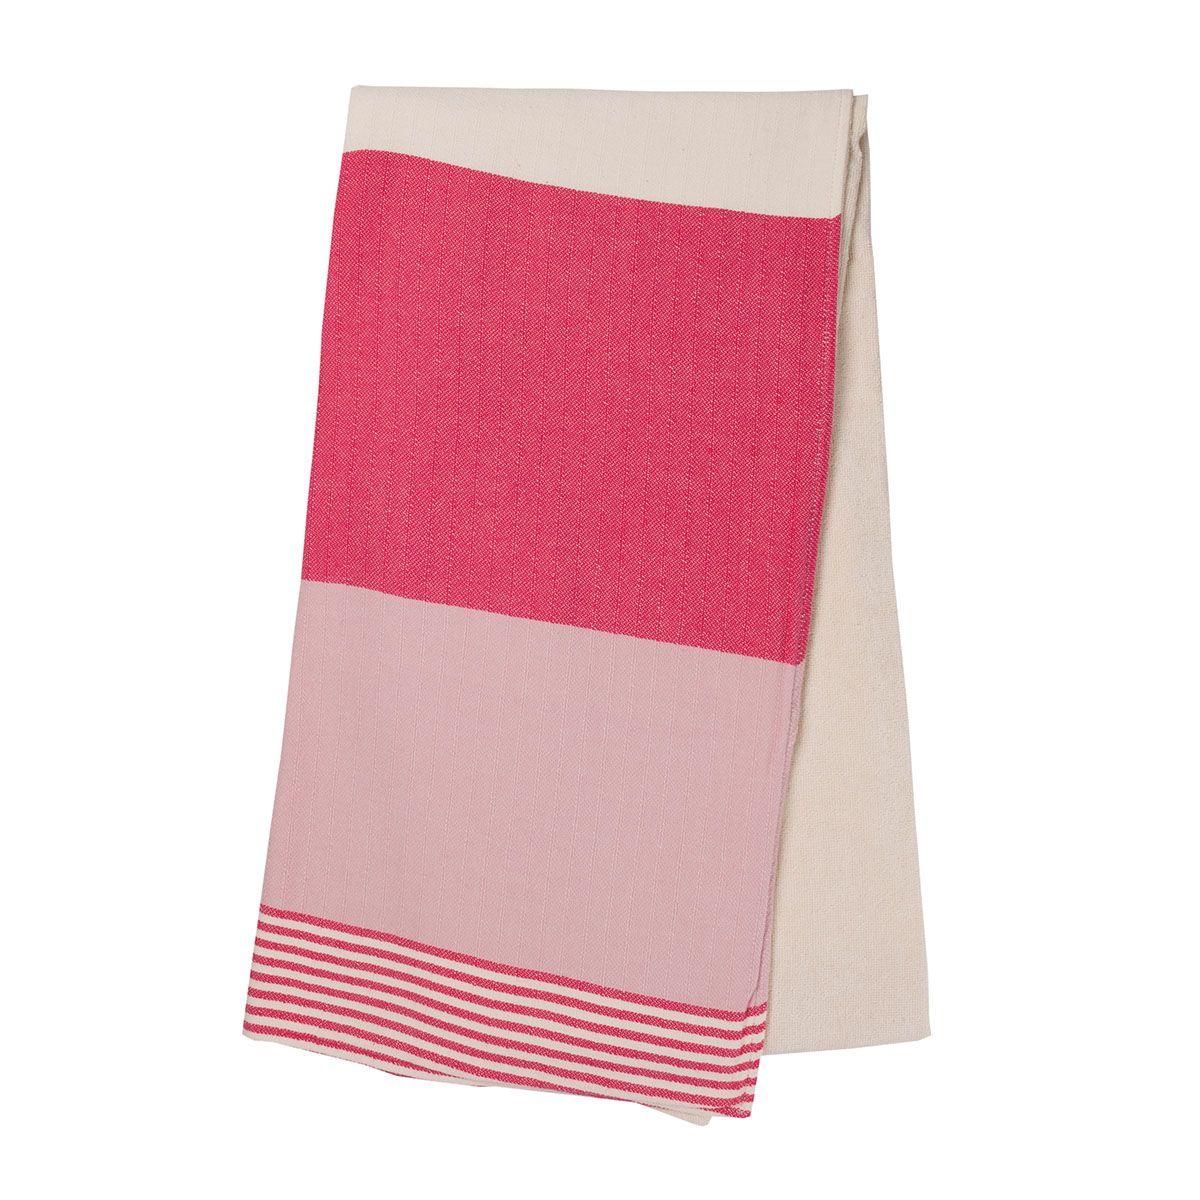 Peshtowel Twin Sultan - Fuchsia / Rose Pink